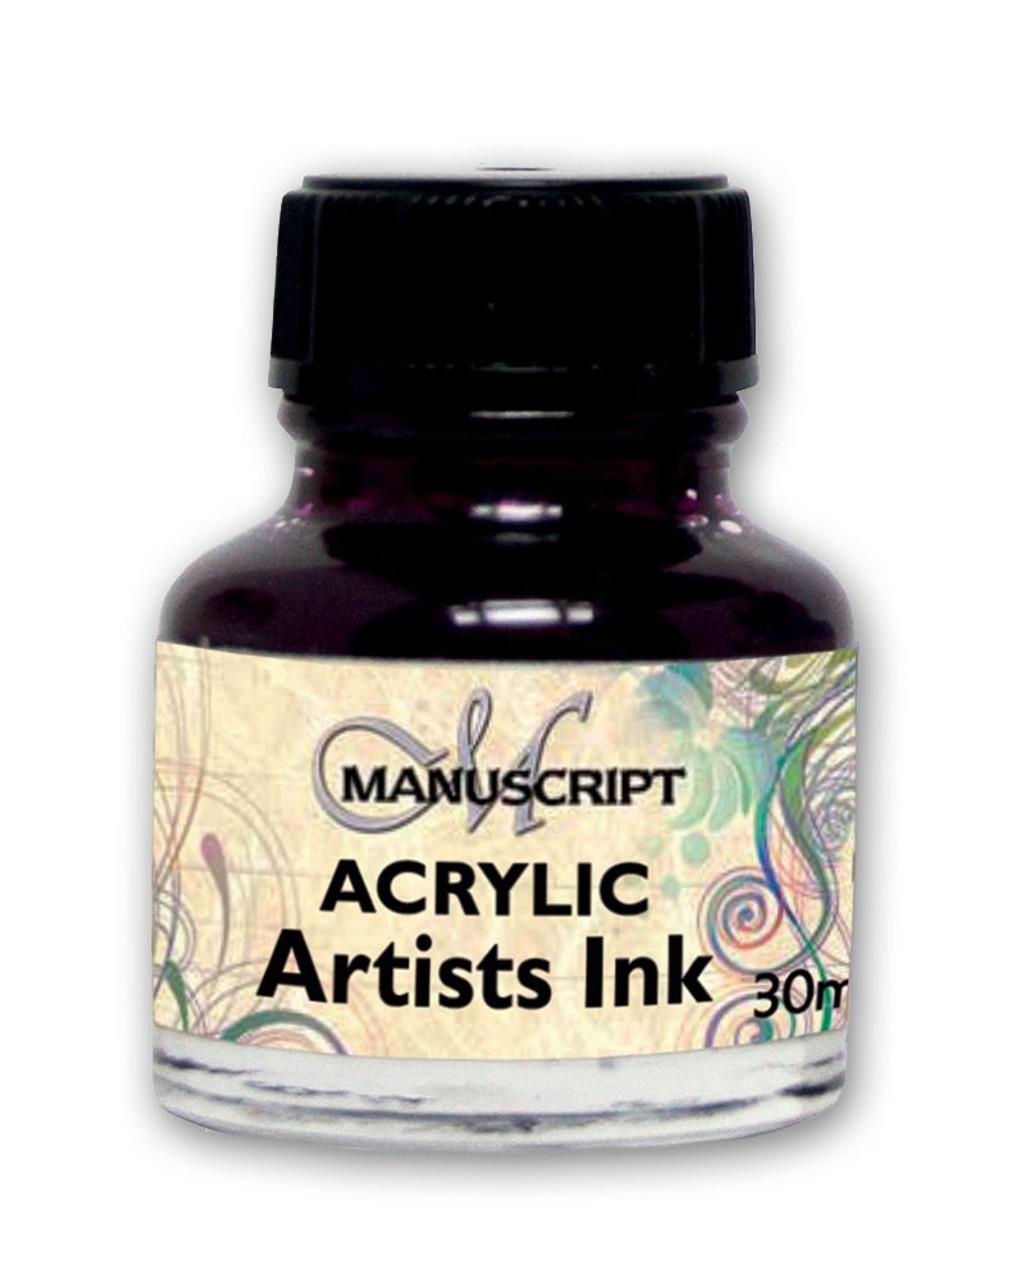 Manuscript 30ml Purple Artists Acrylic Ink Bottle